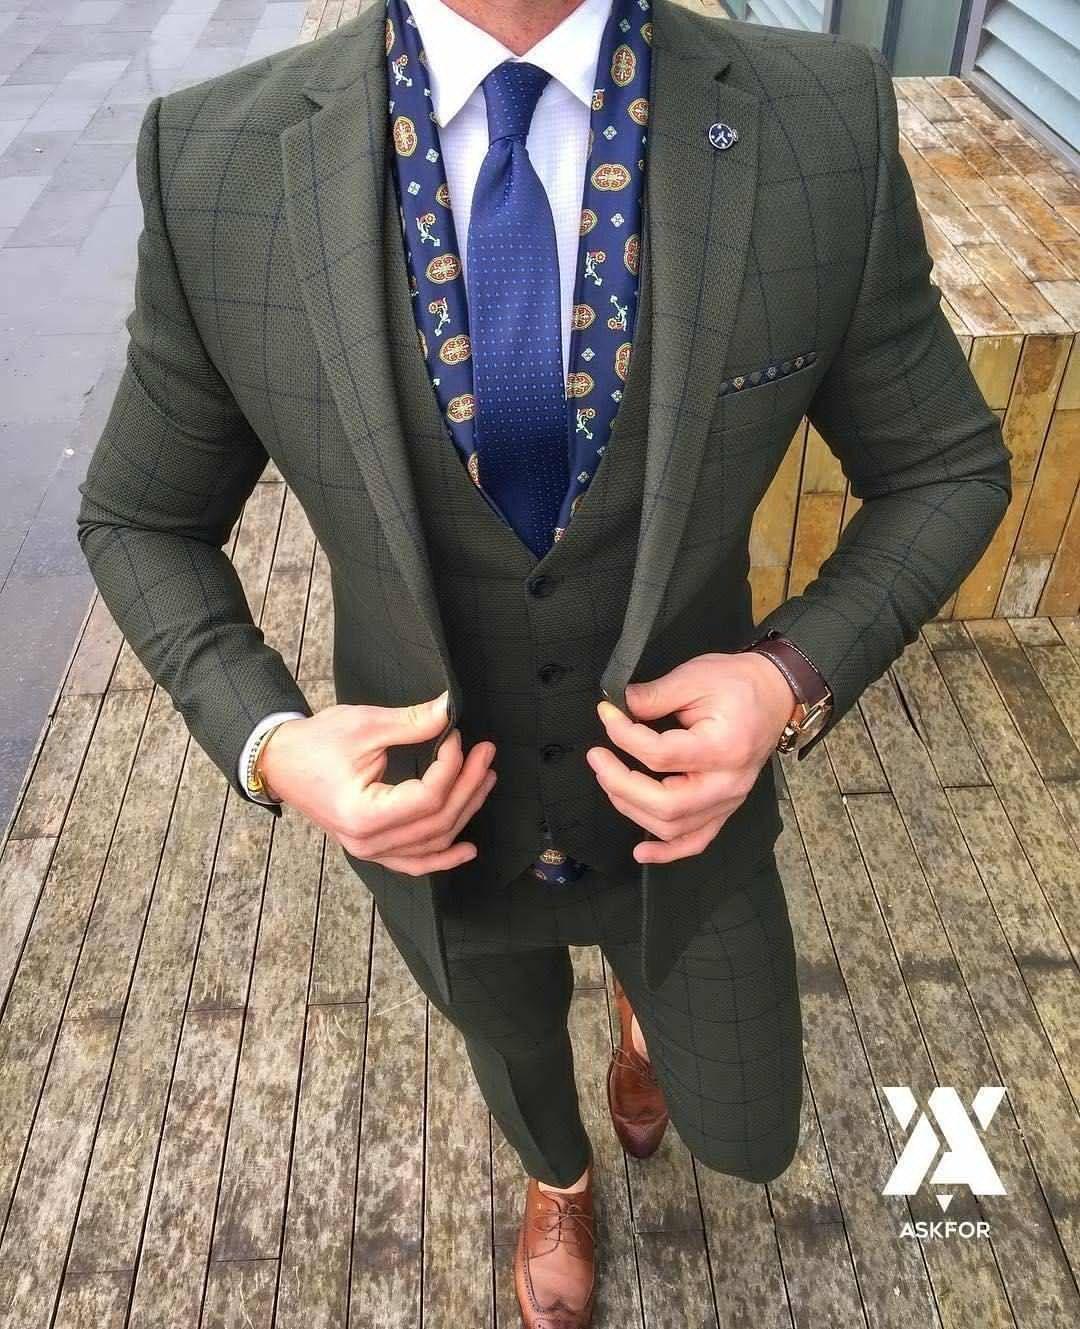 Flannel shirt under suit  wtfmenmensfasionchoosemensflannelshirt